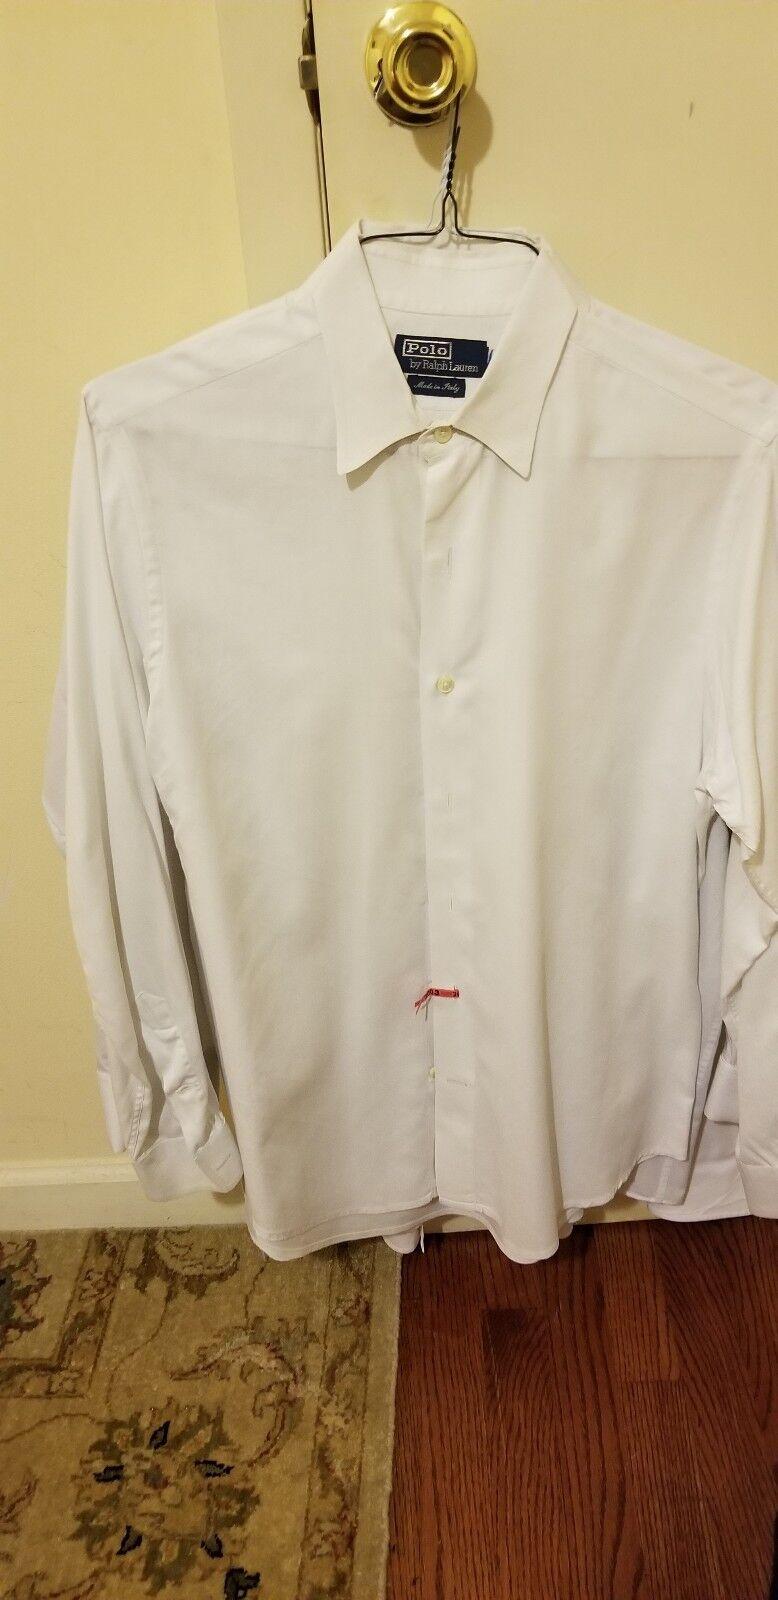 Polo Polo Polo by ralph lauren Weiß dress shirt Größe 16 32 Made in  301761